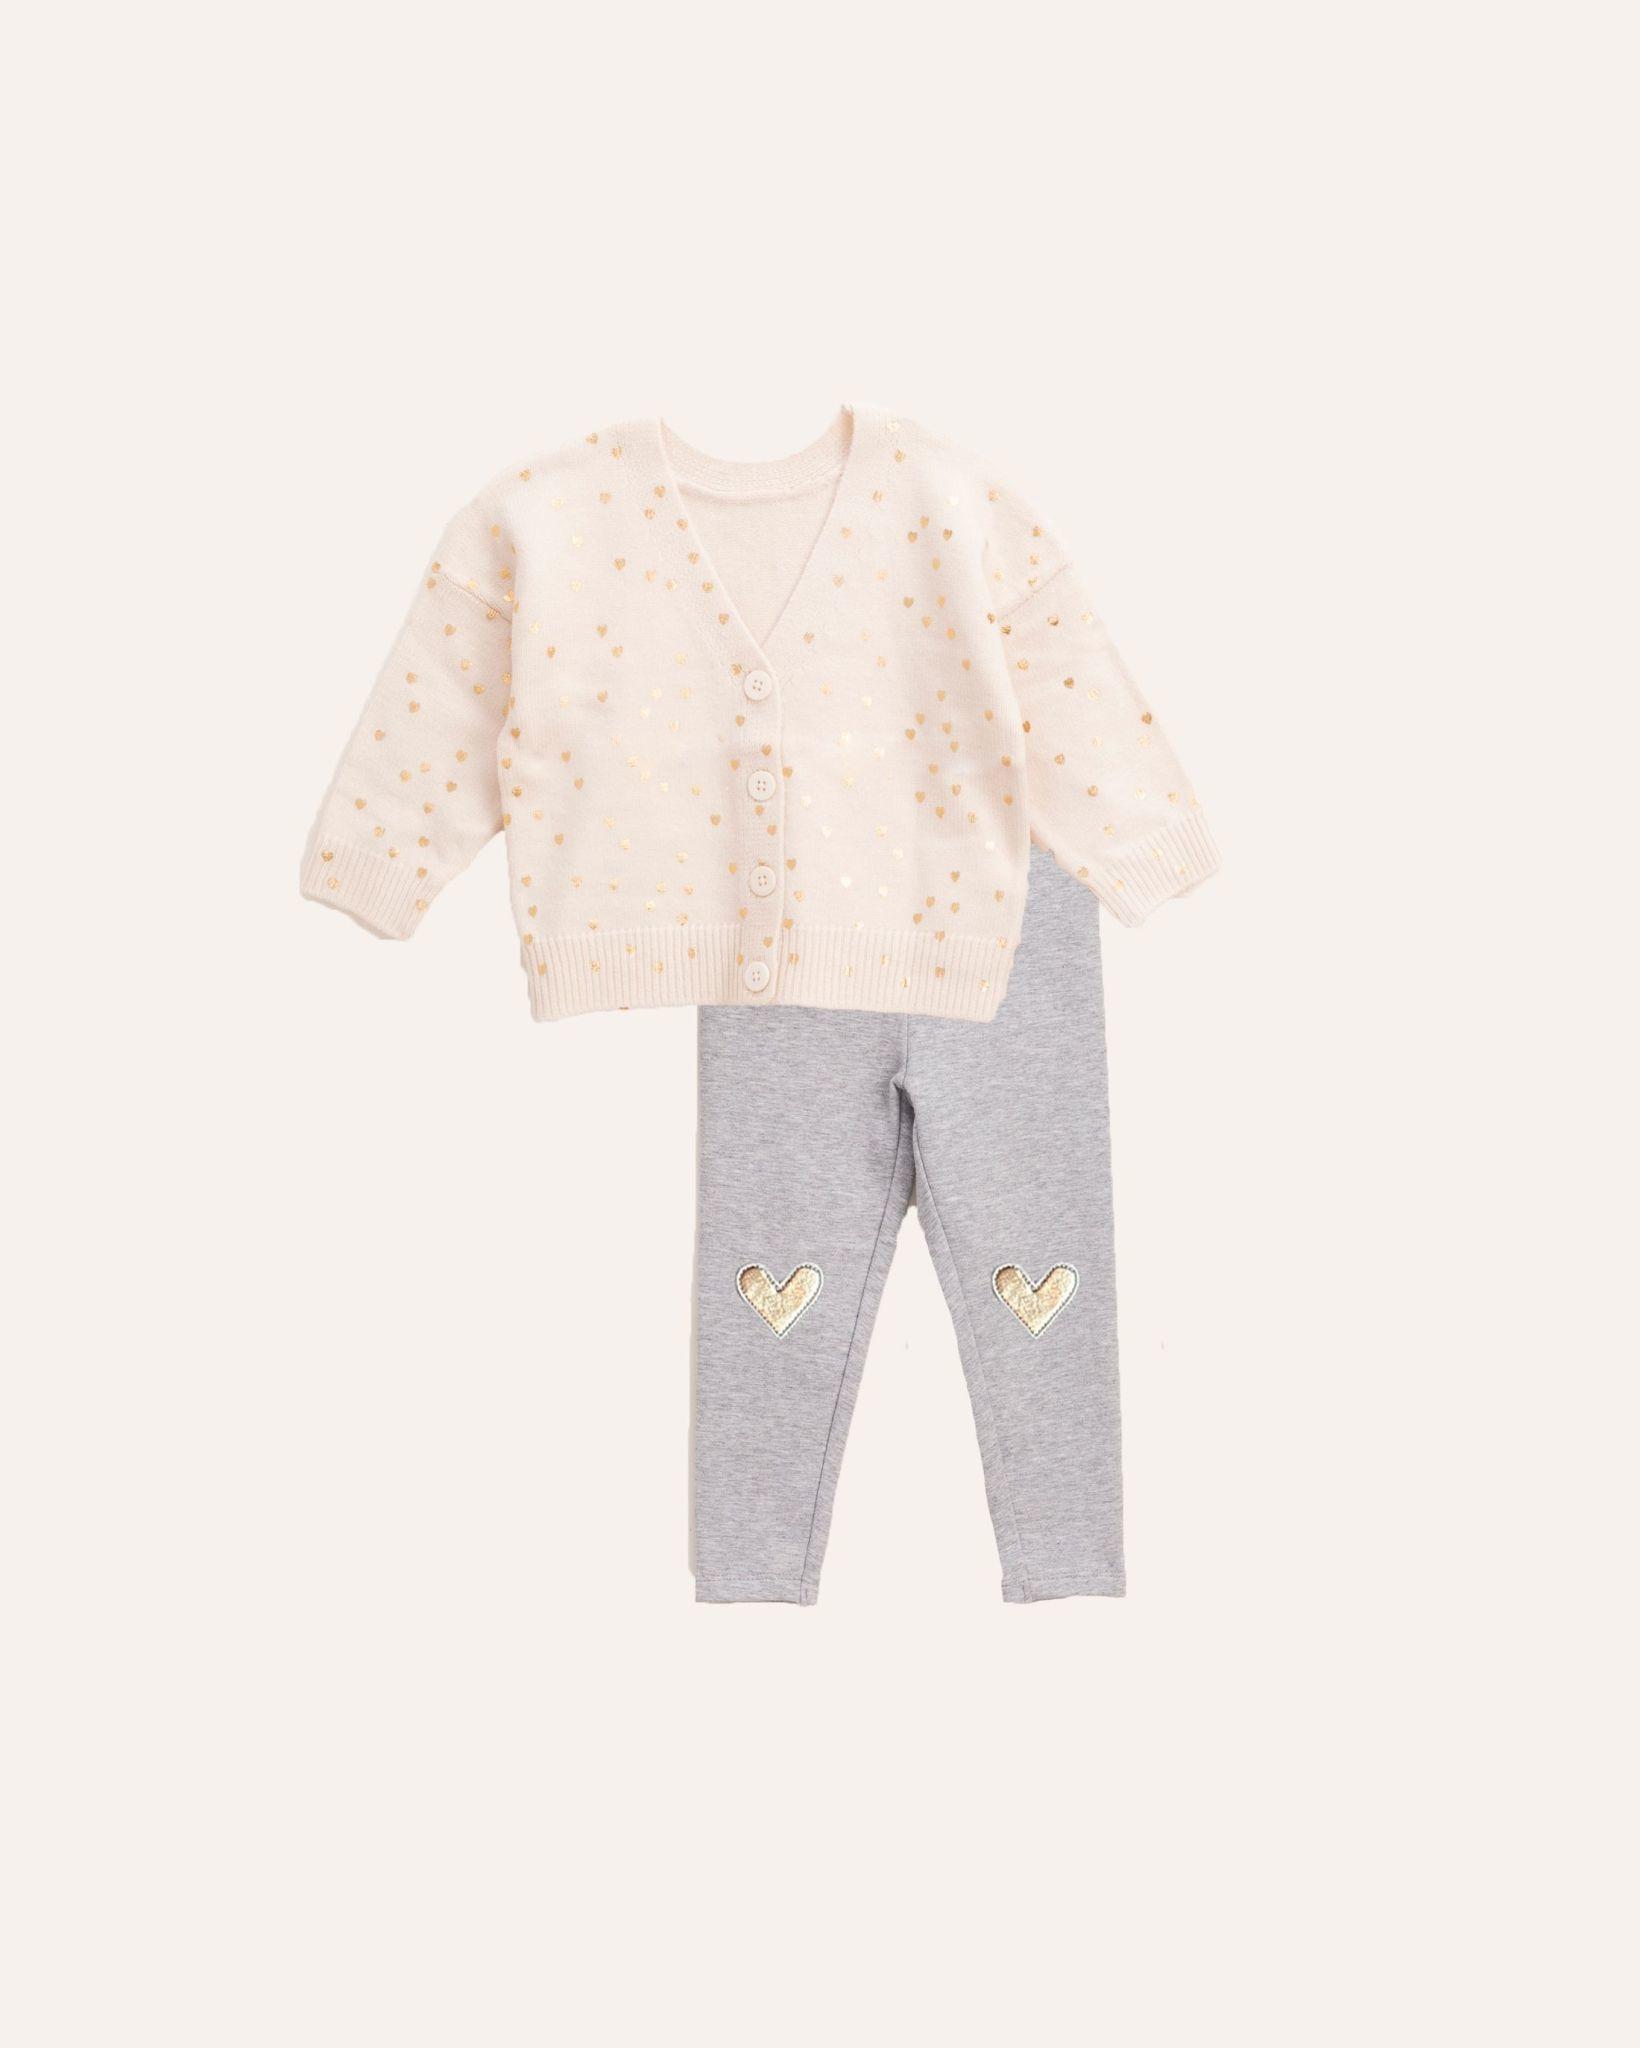 Splendid Splendid Golden Hearts Sweater Set